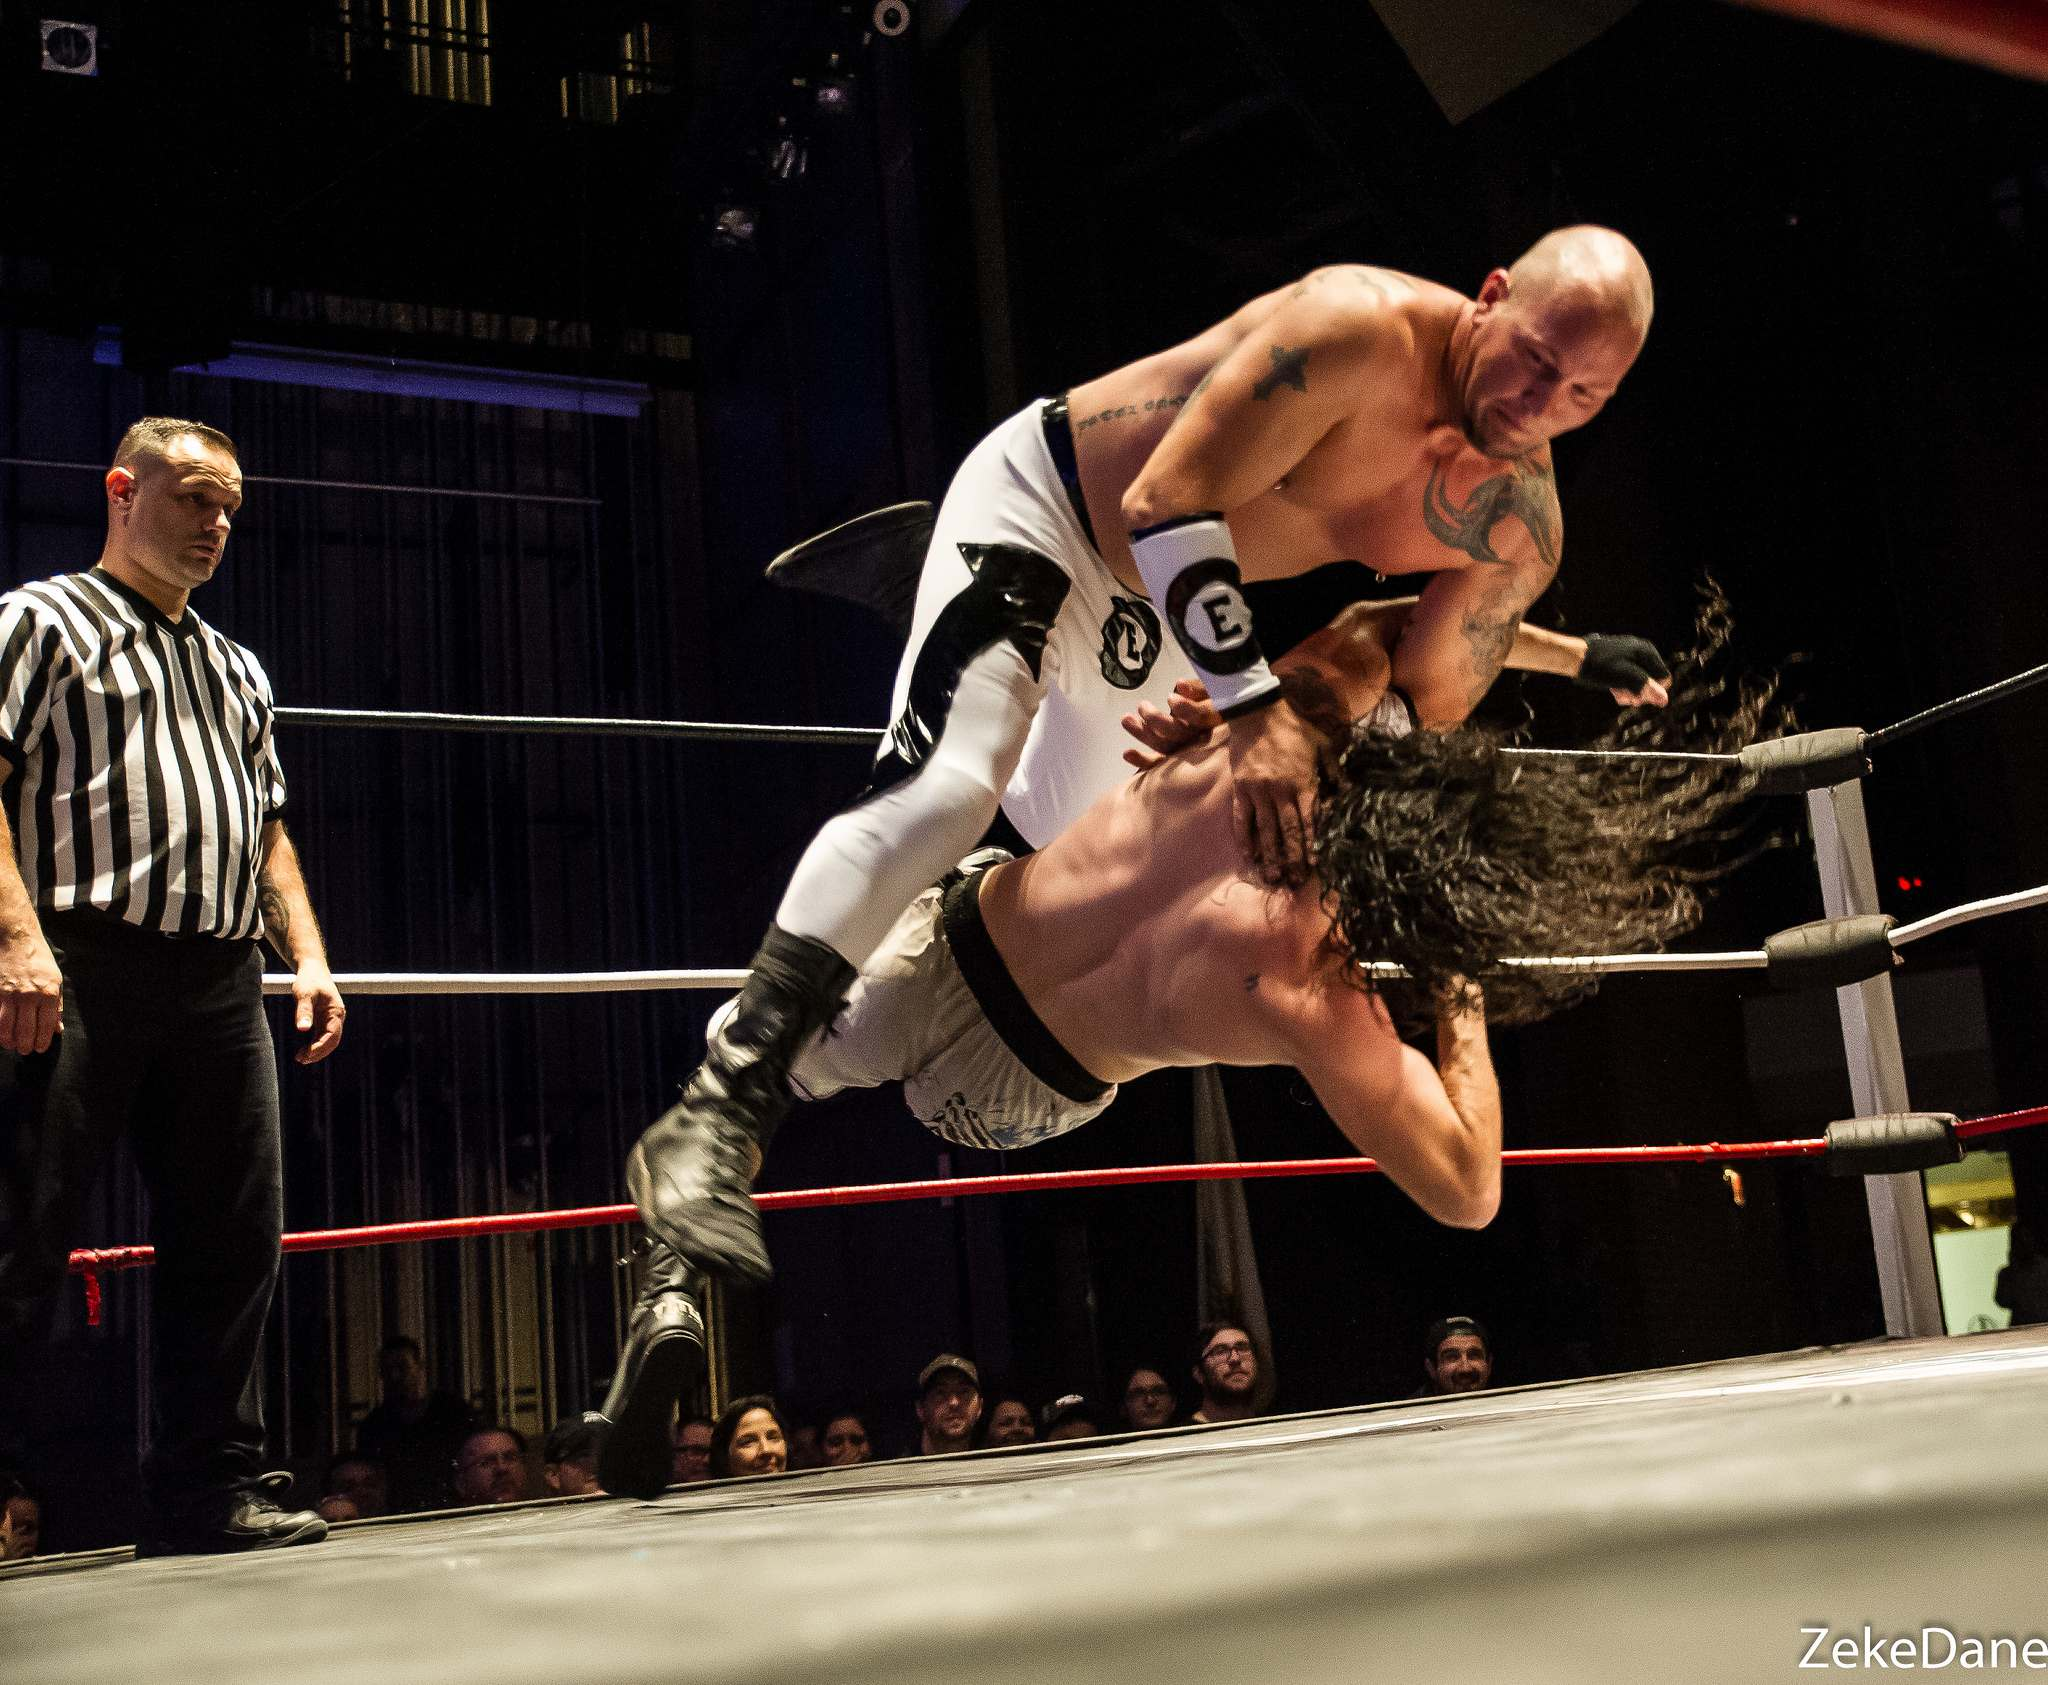 pro wrestling1 Pro Wrestling in New England 2016